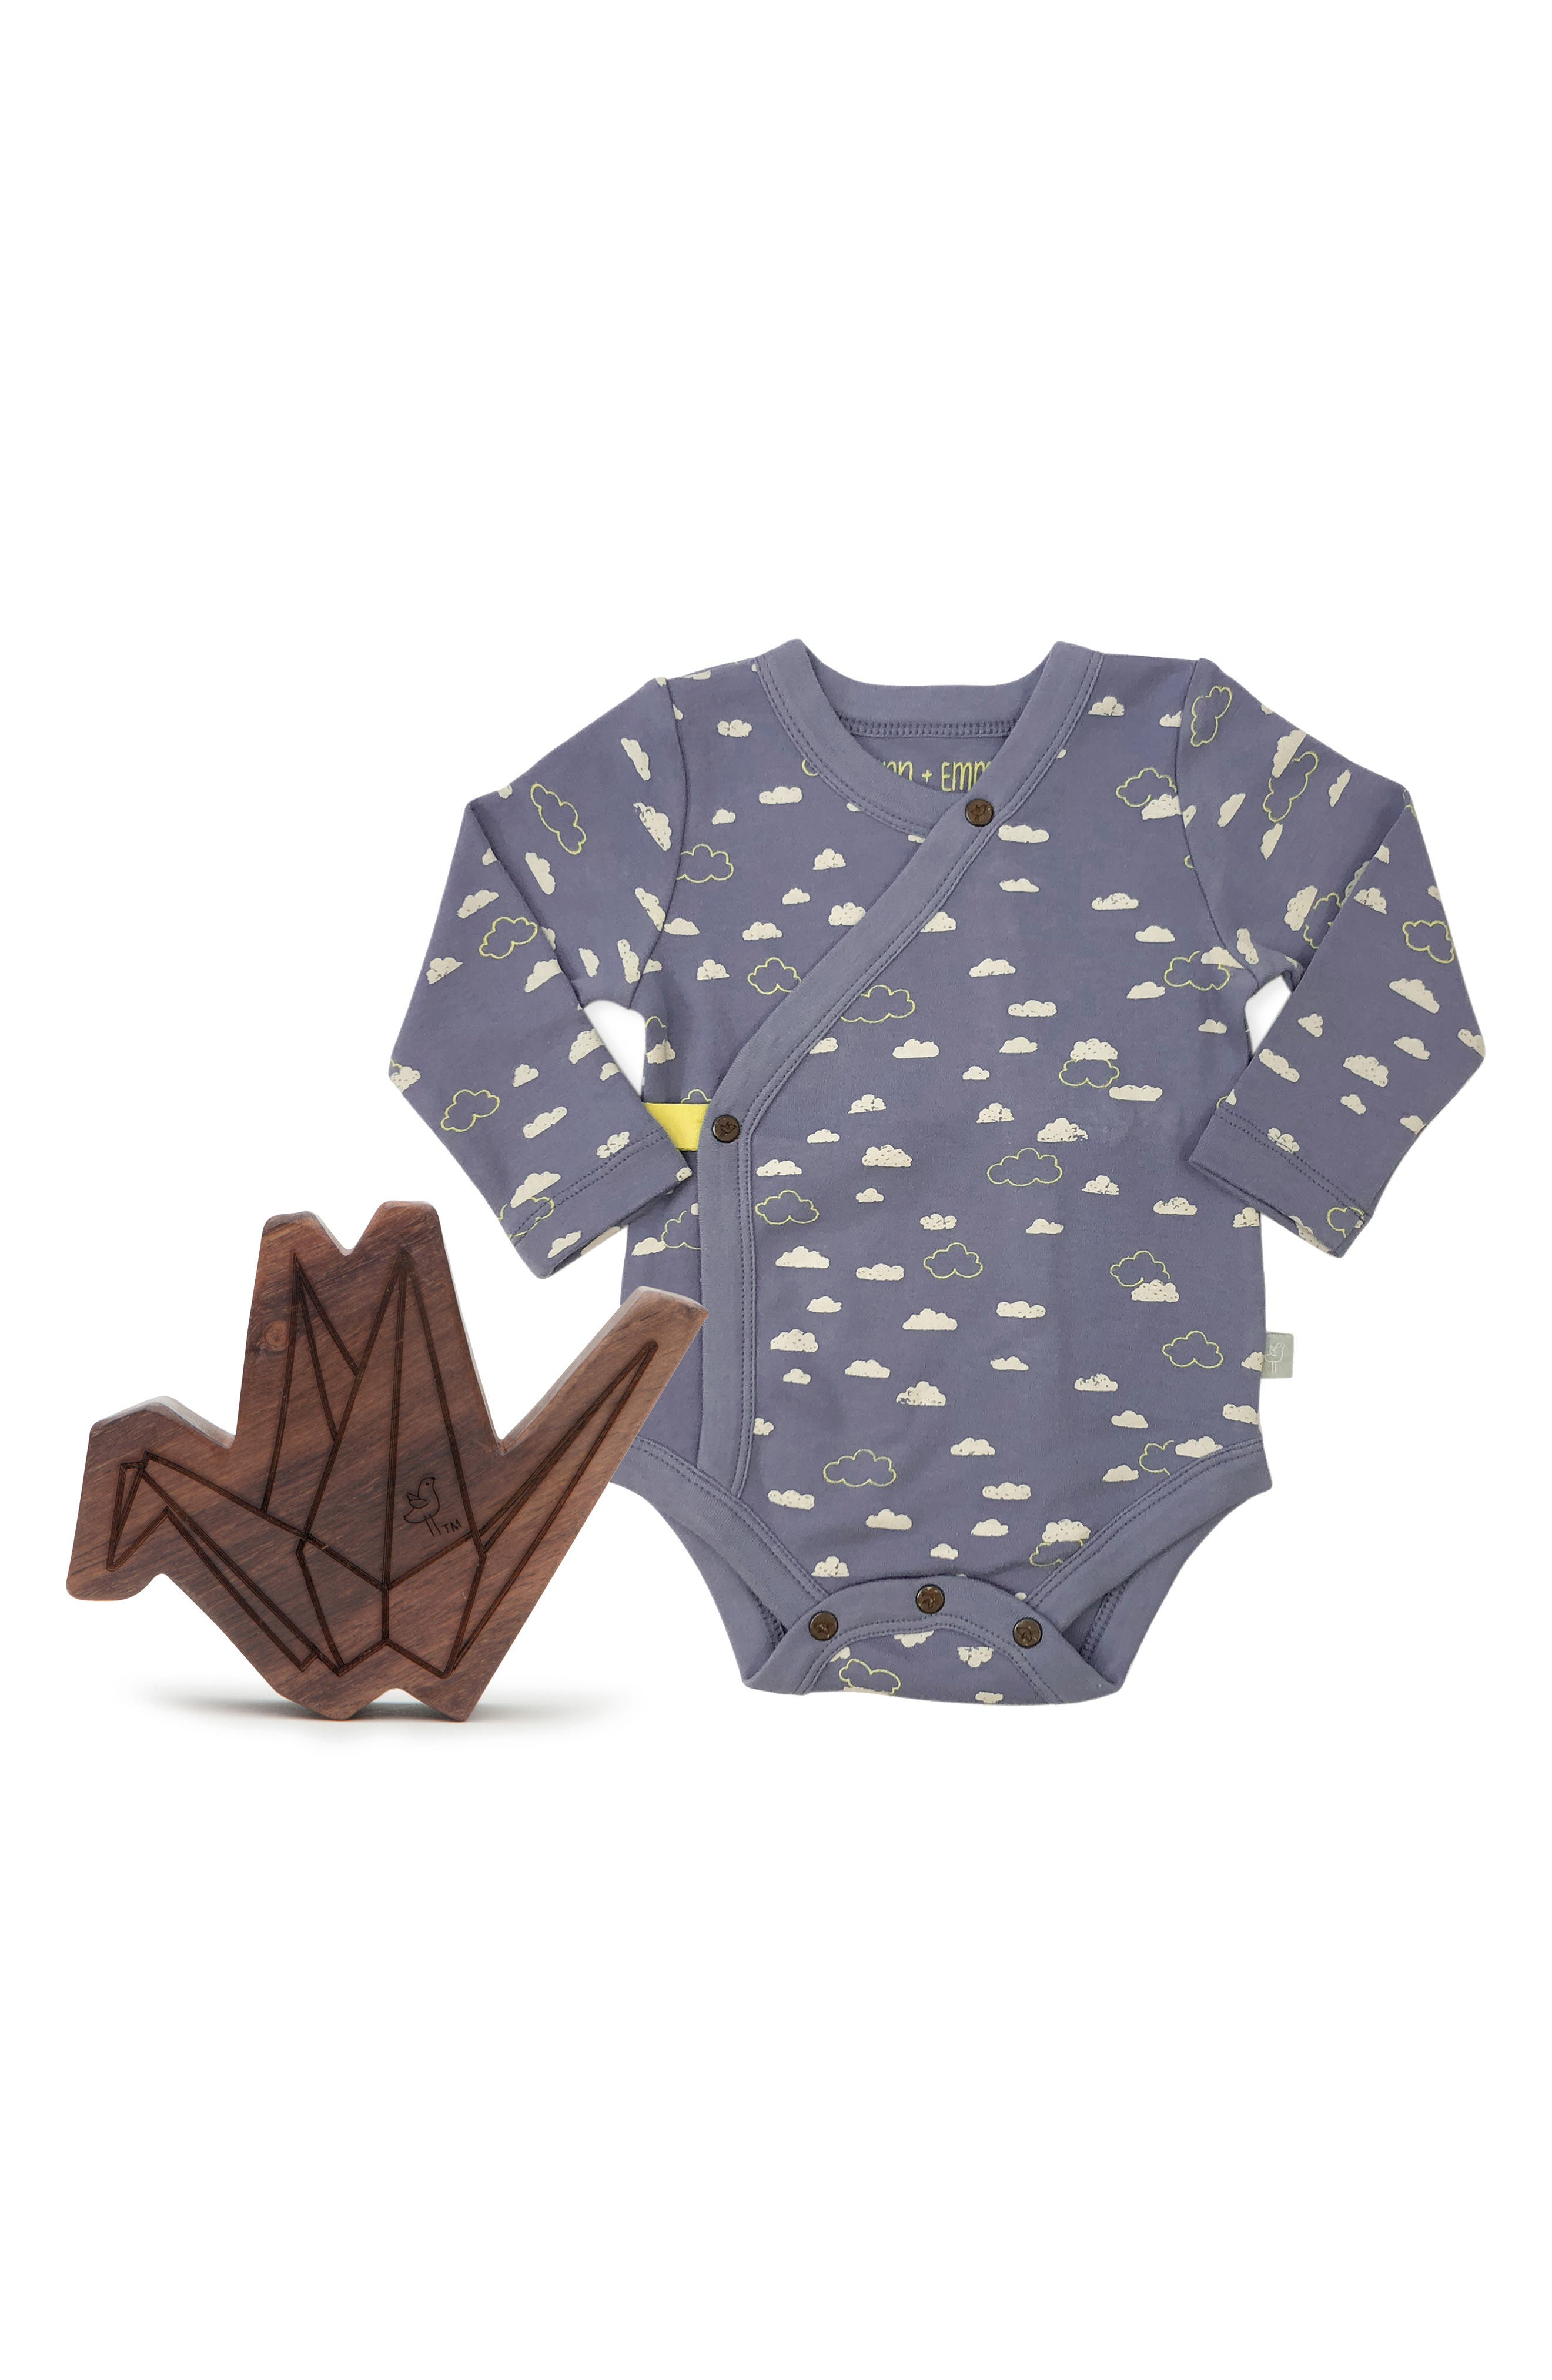 Clouds Organic Cotton Wrap Bodysuit & Origami Wood Teether Rattle Set,                             Main thumbnail 1, color,                             450